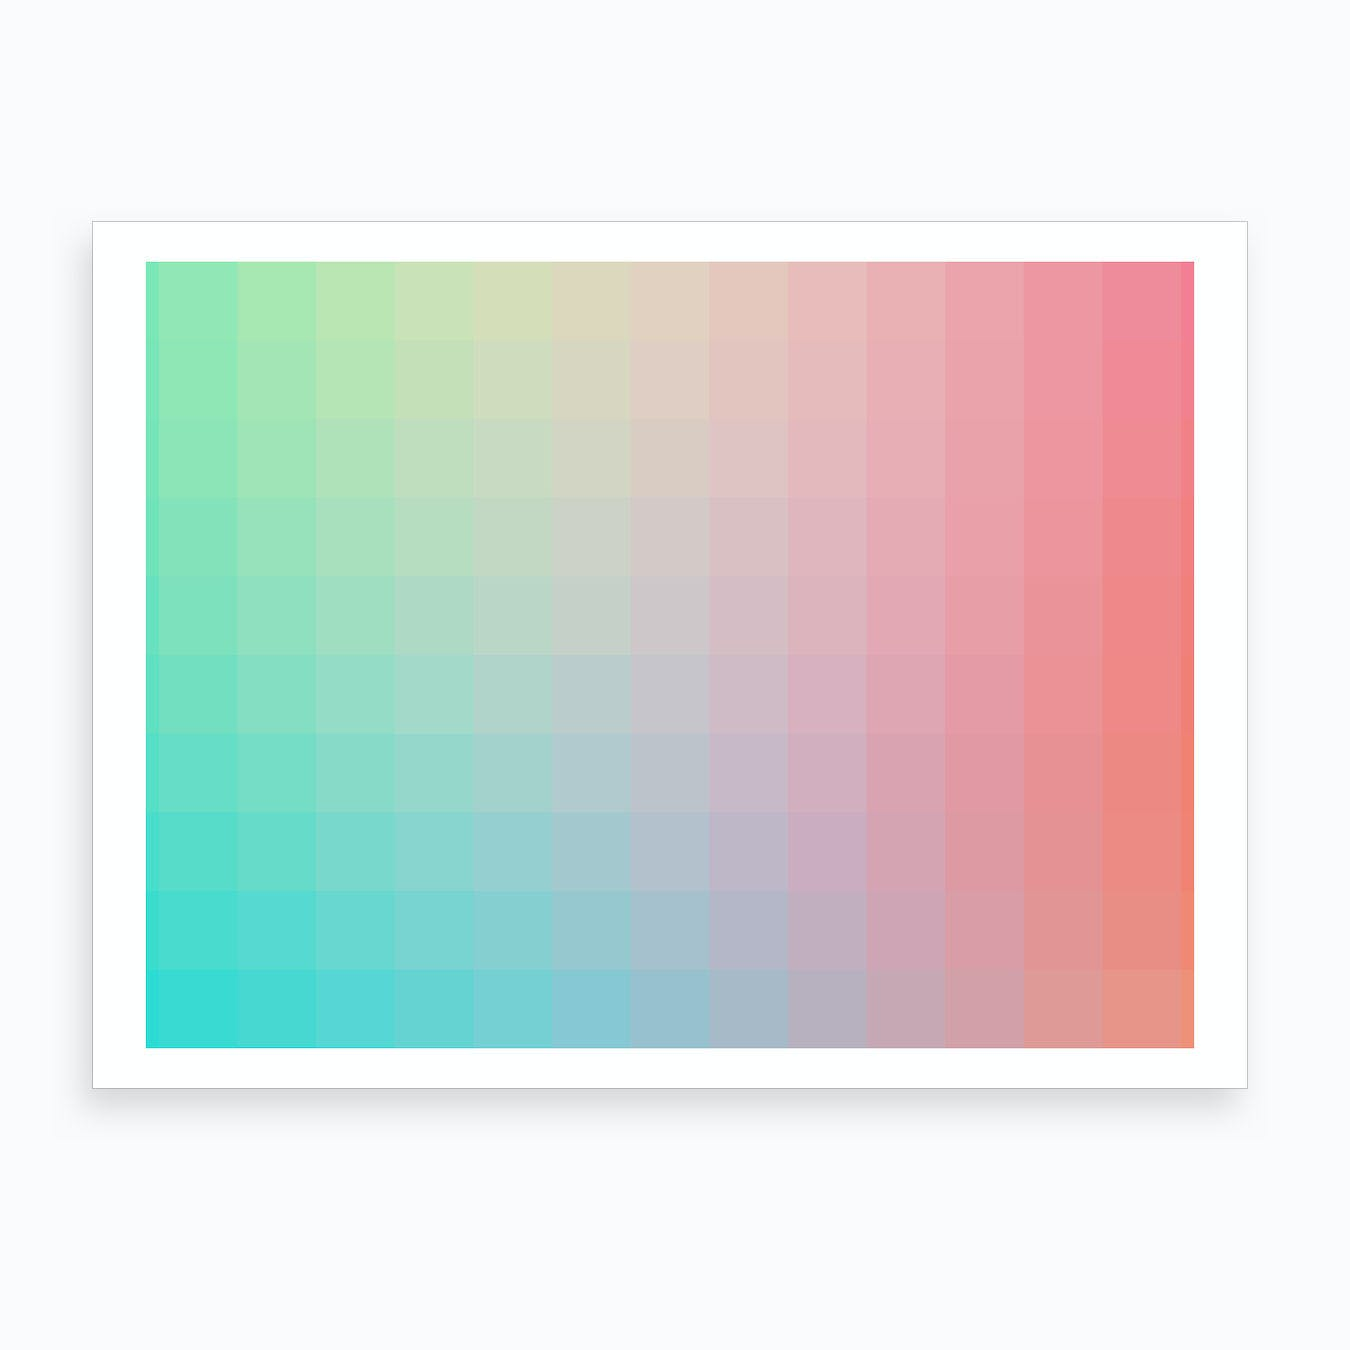 Lumen 01, Pink and Teal Gradient Art Print